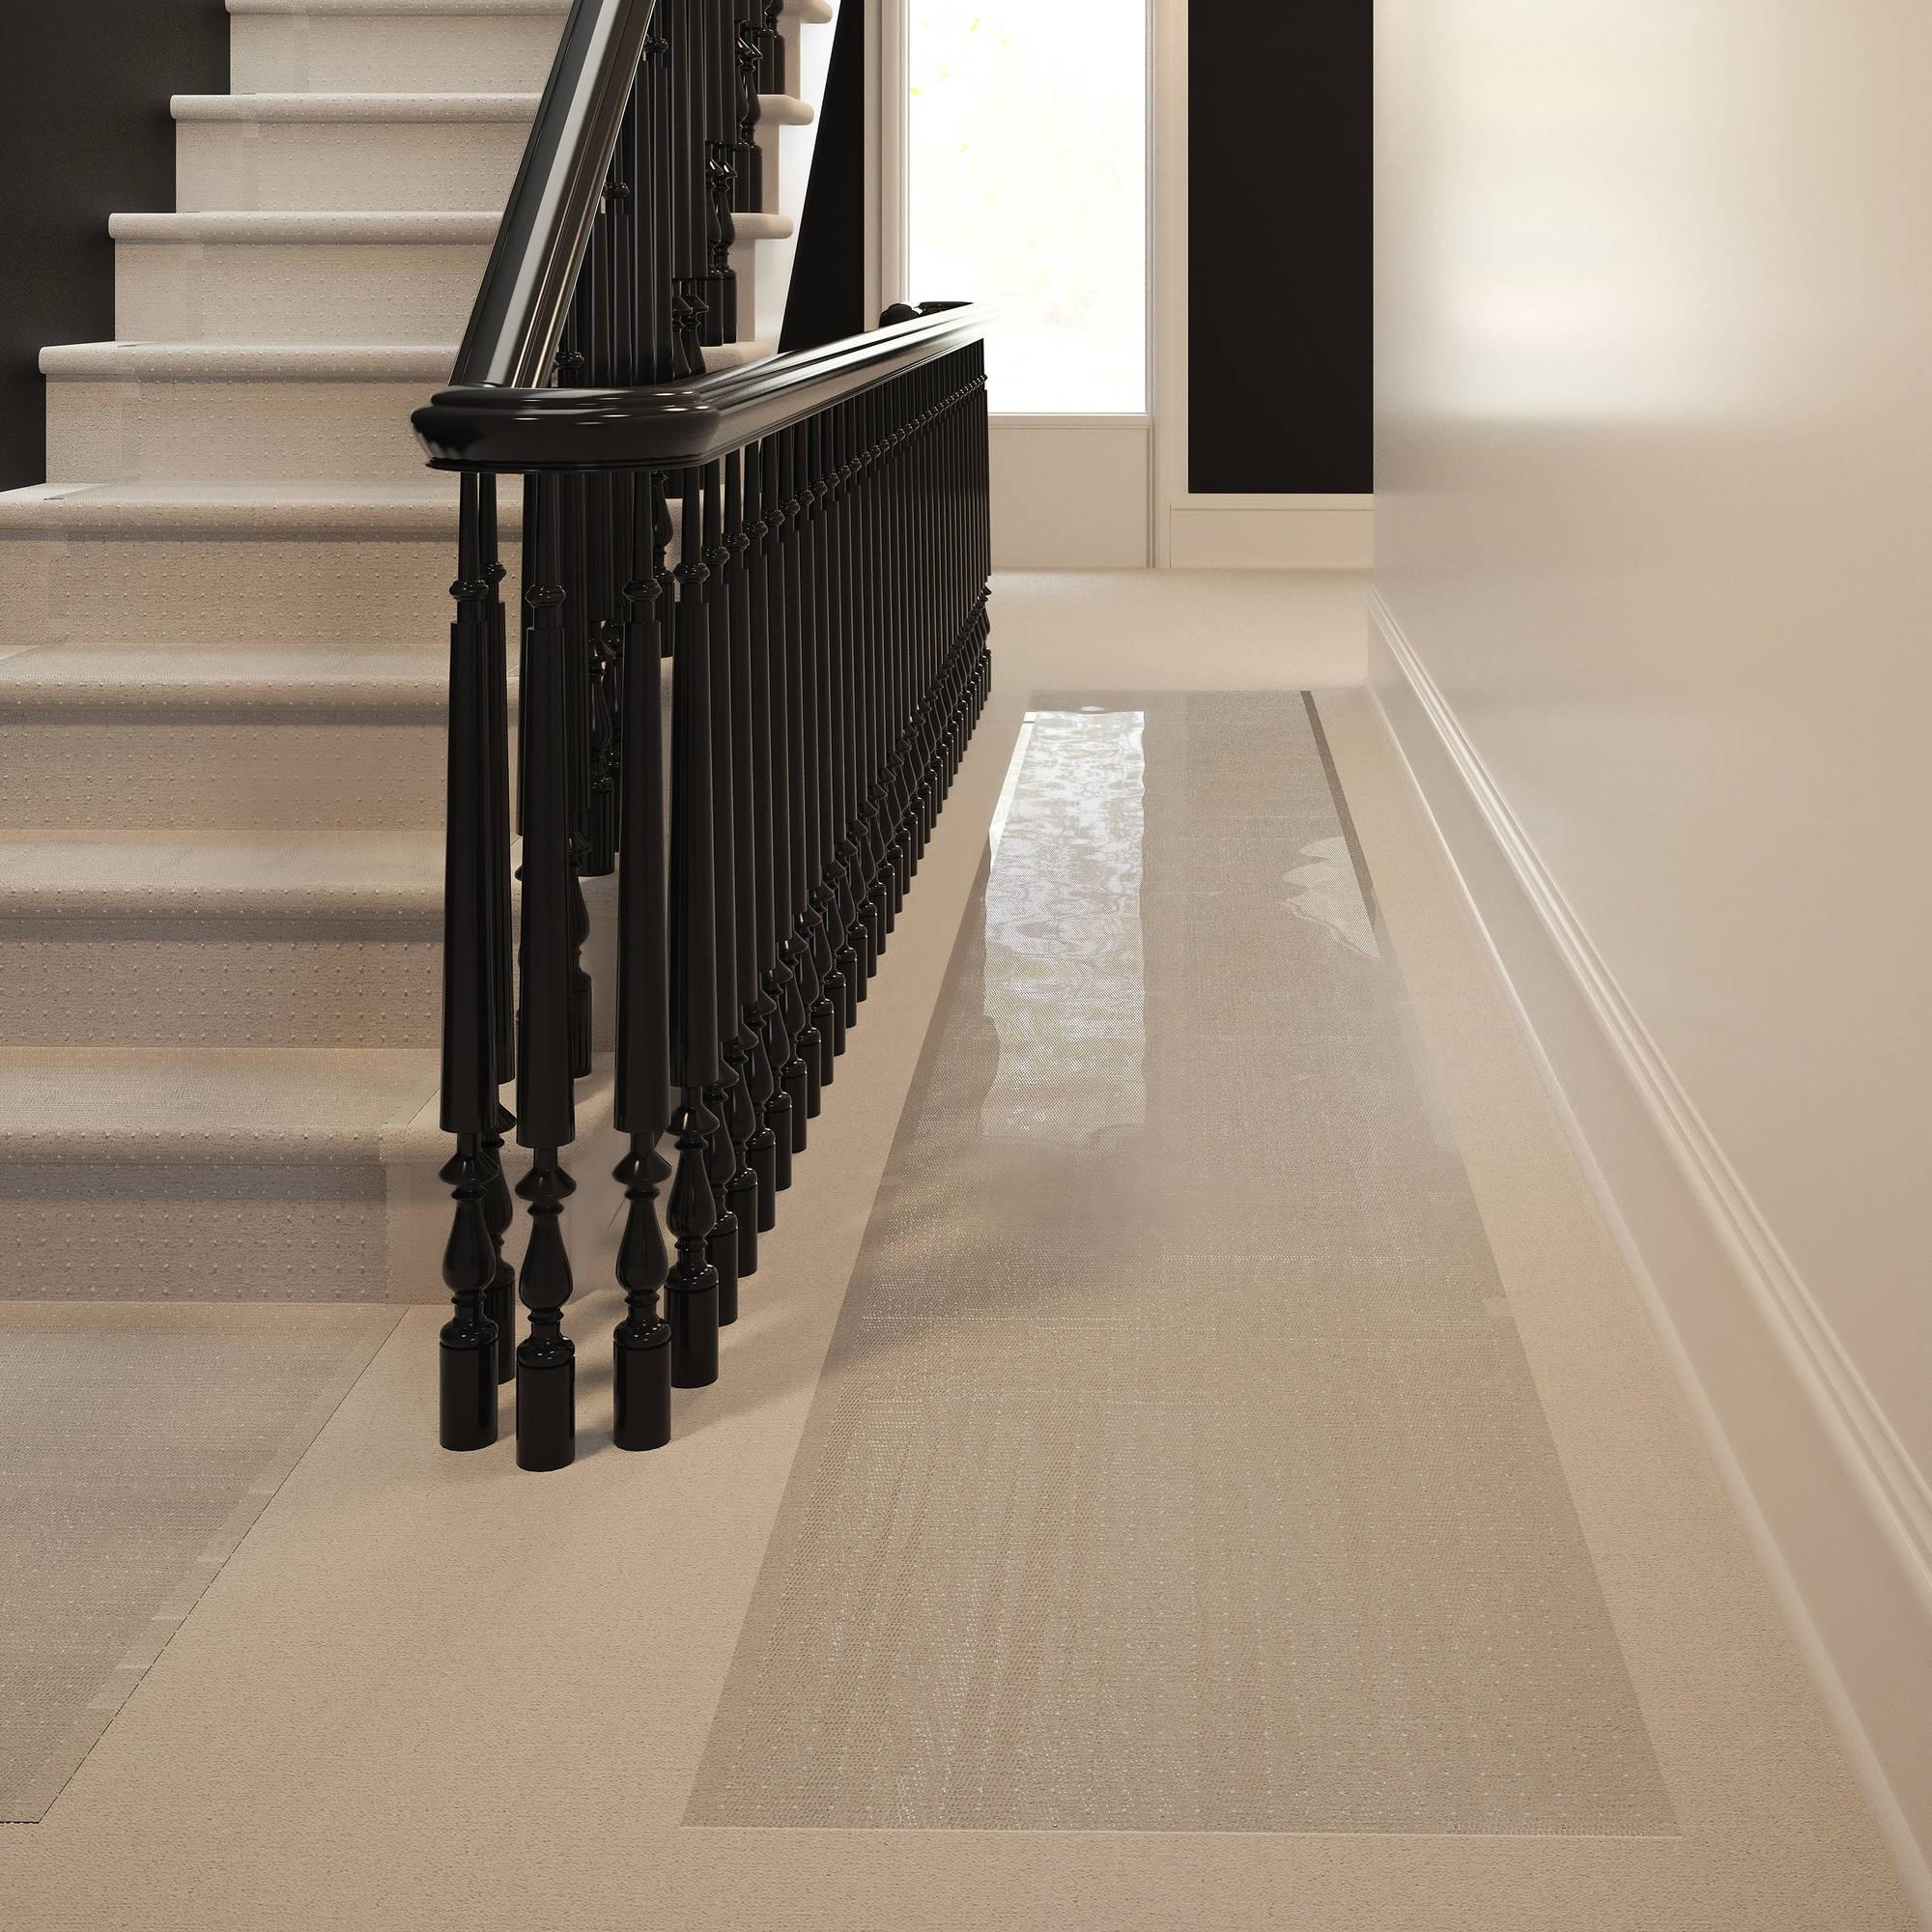 Mainstays Low Pile Carpet Vinyl Runner Clear 2 X 12 Walmart Inside Clear Stair Tread Carpet Protectors (#13 of 20)